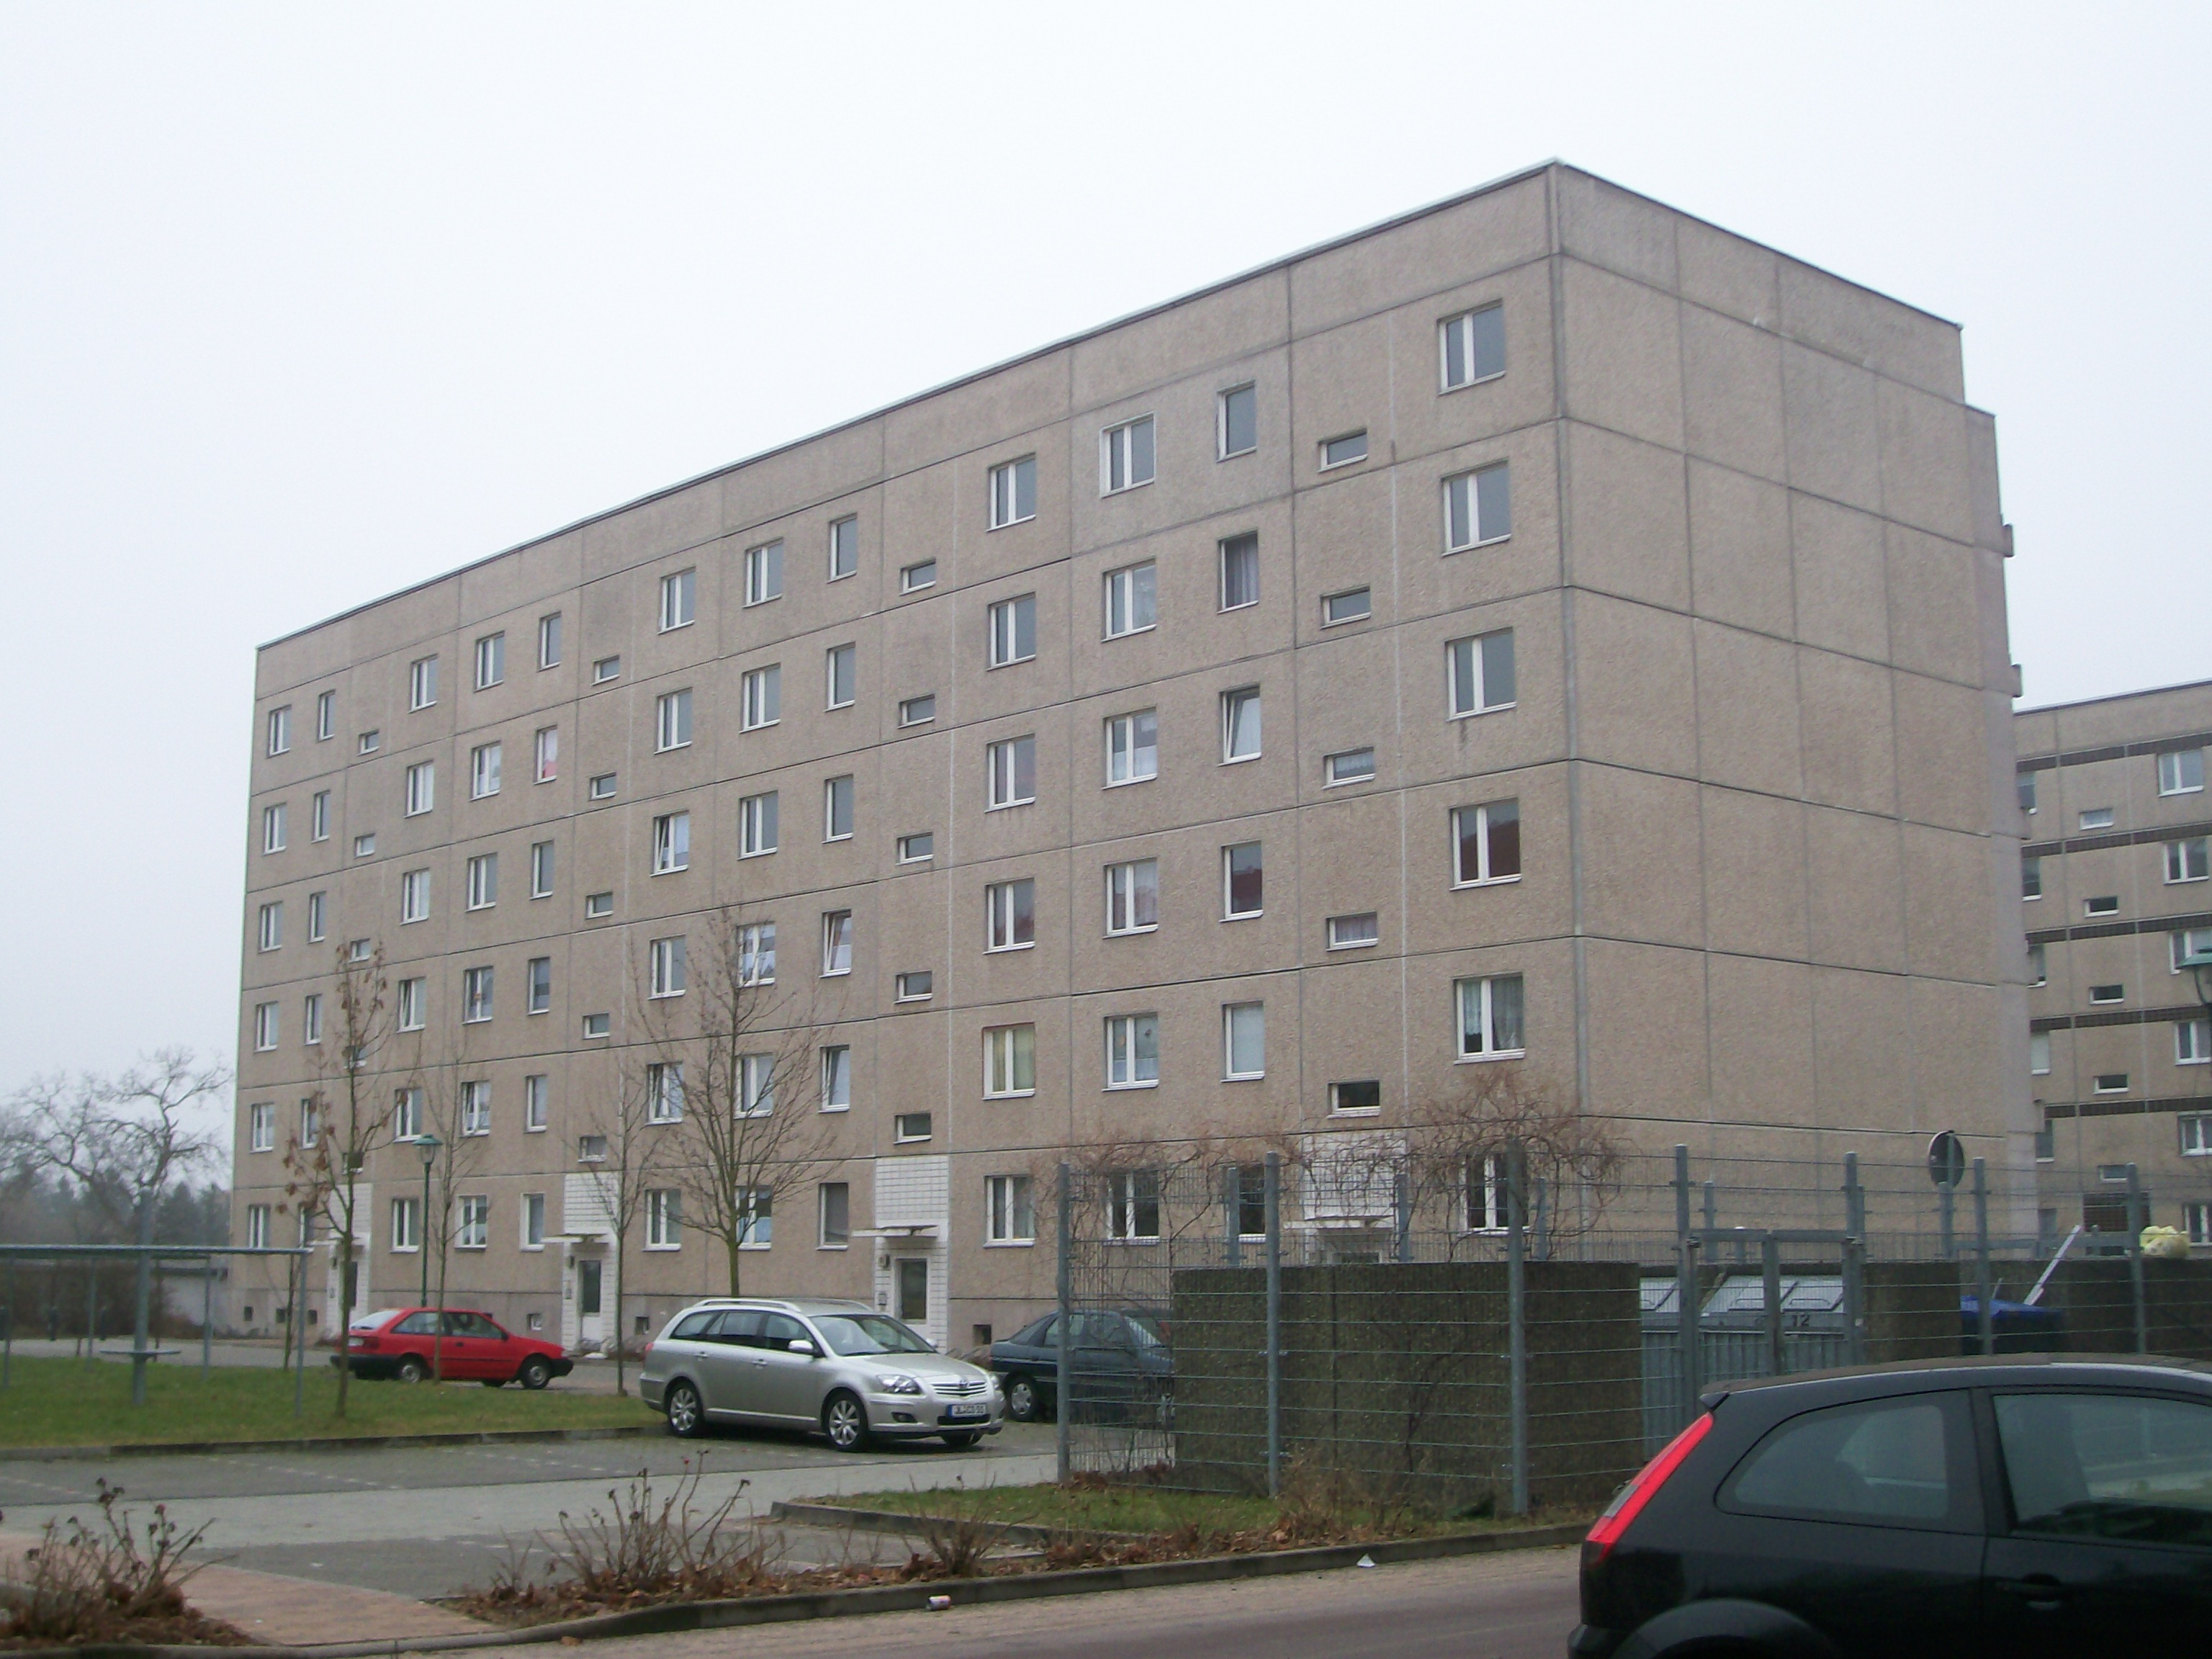 Wohnung - Am Kellerberg 15